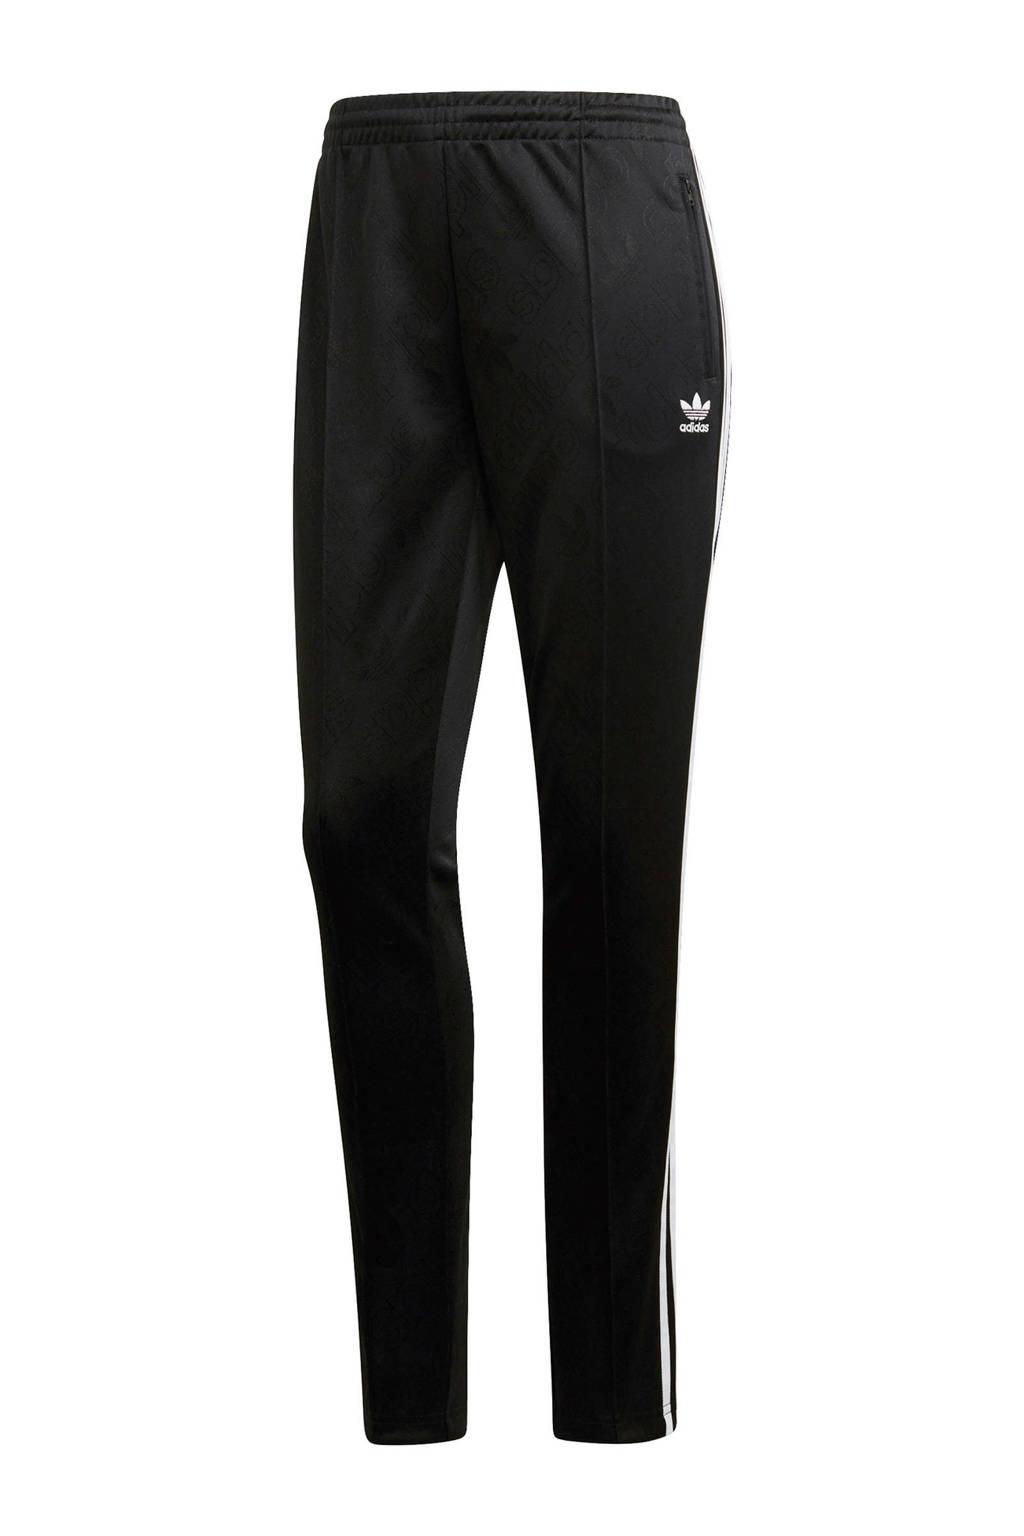 adidas originals regular fit joggingbroek zwart, Zwart